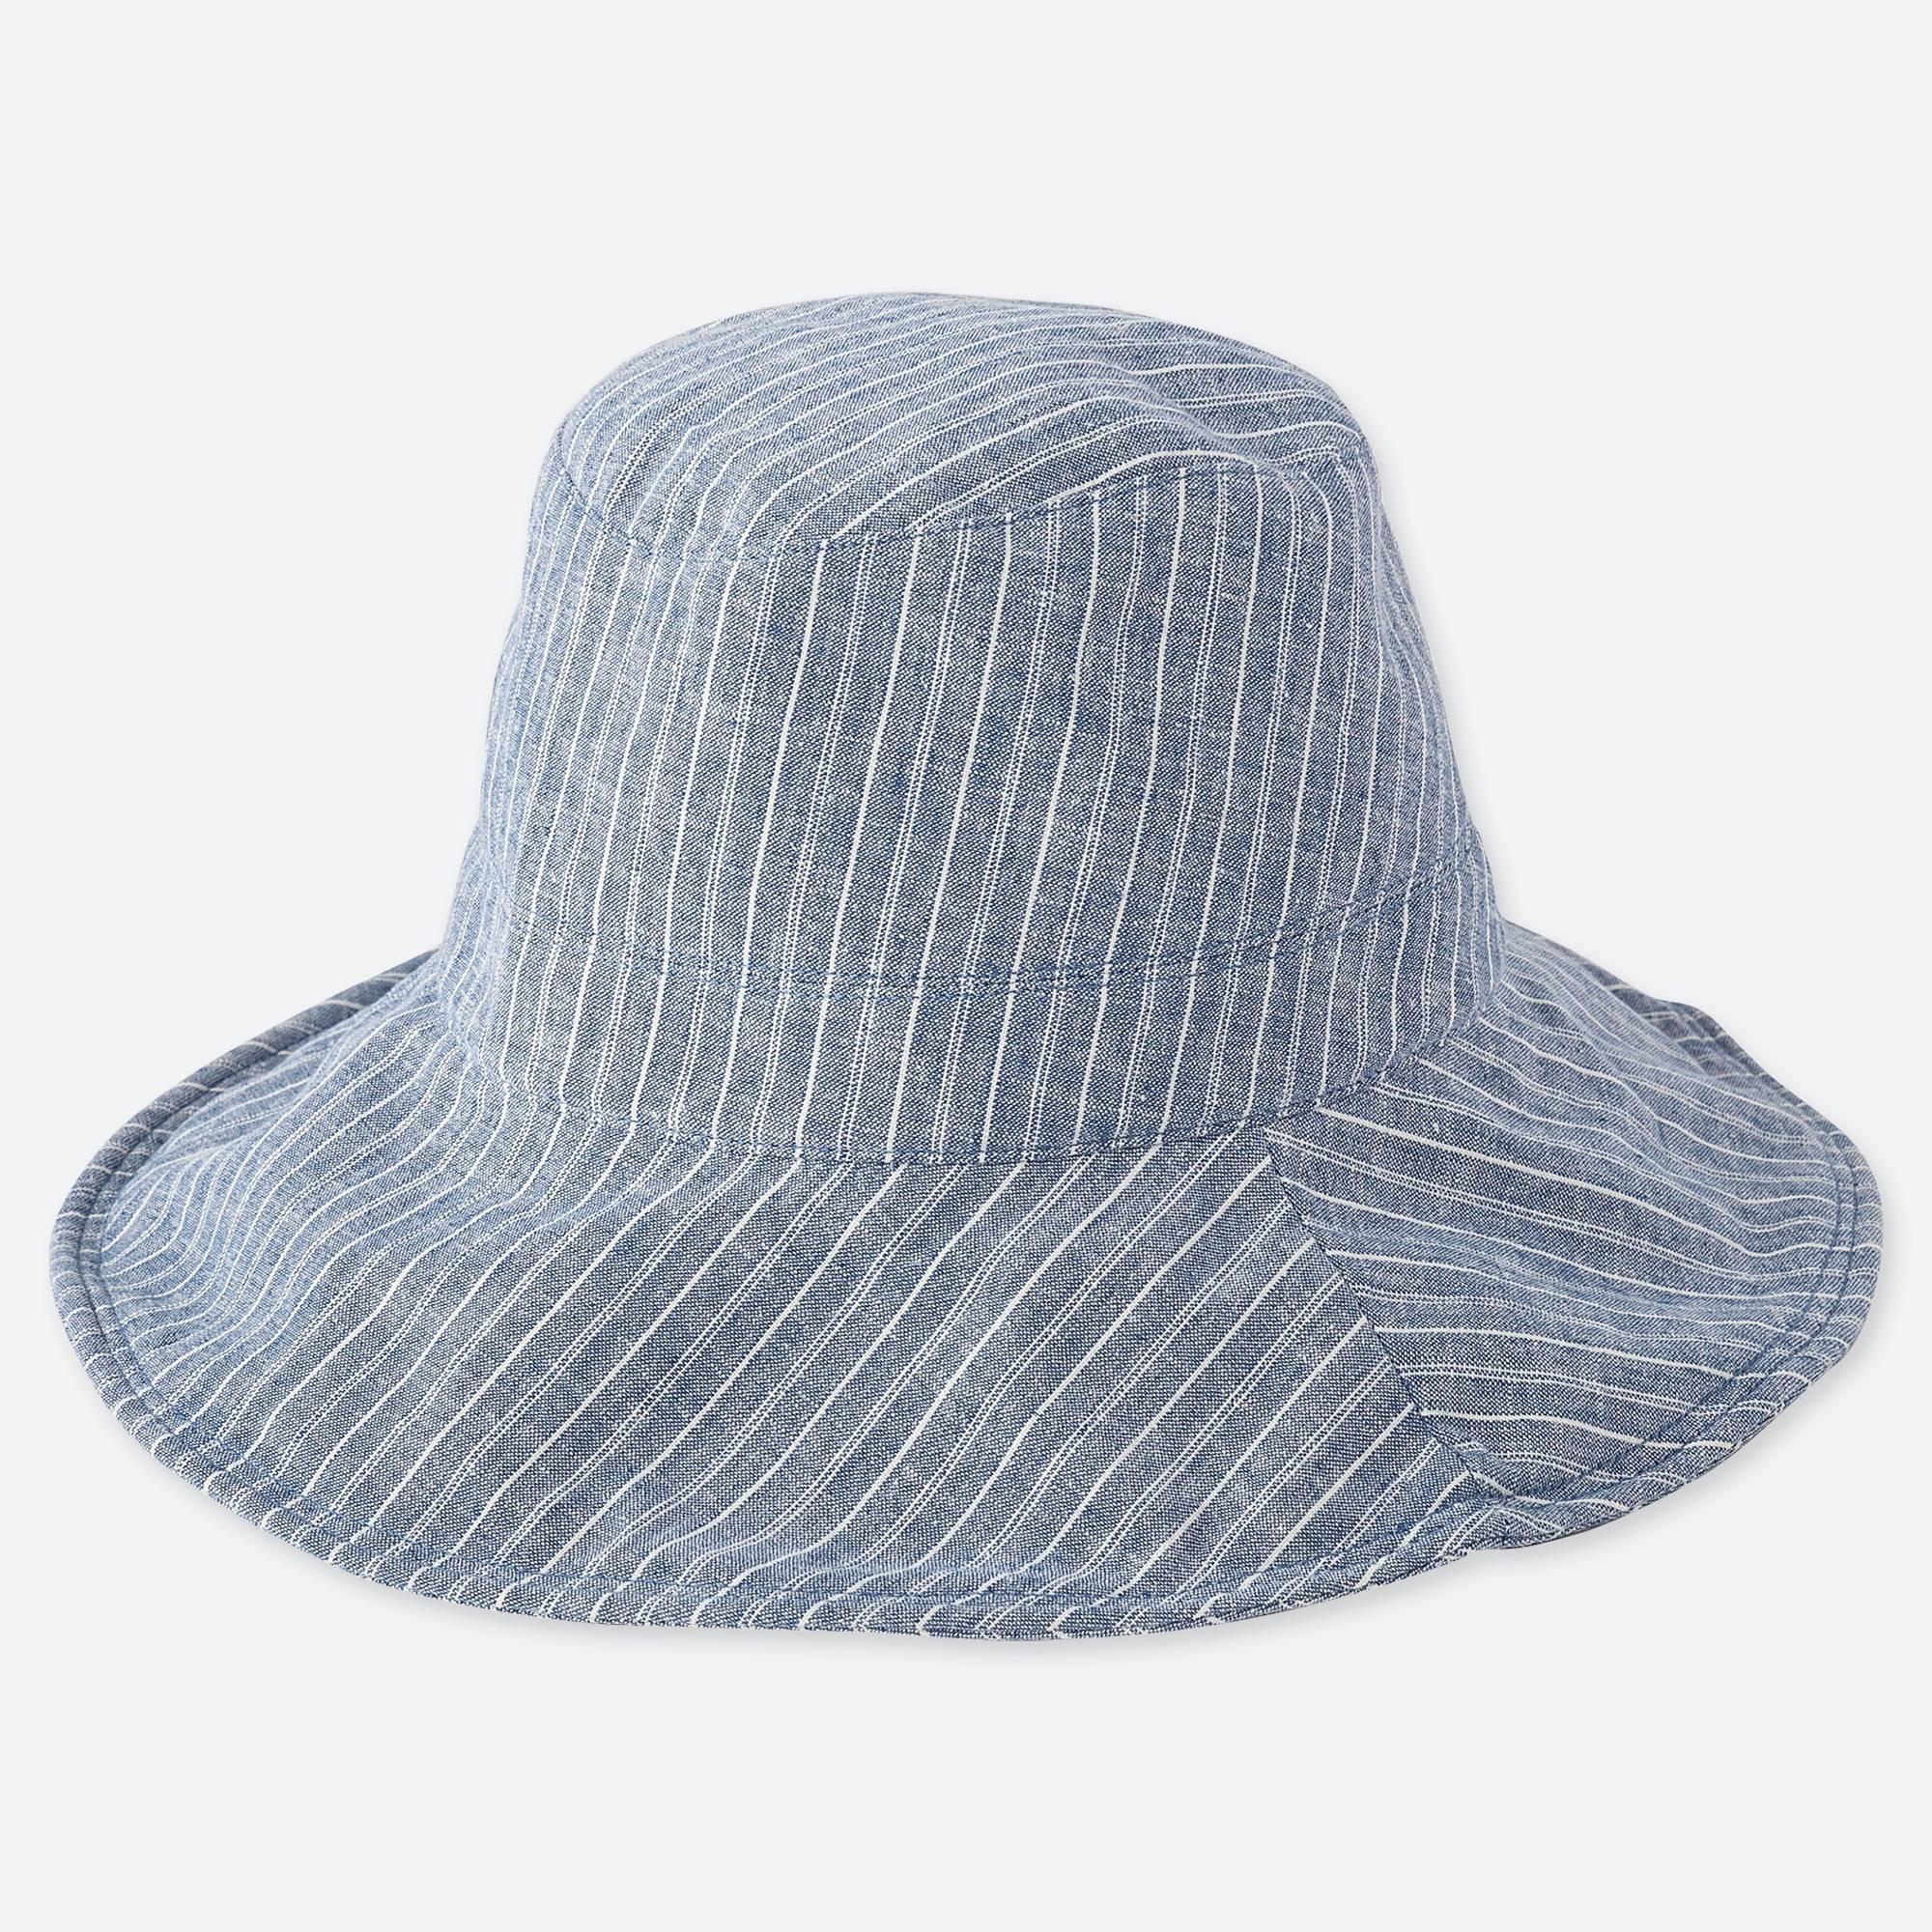 Lyst - Uniqlo Uv Cut Adjustable Hat in Blue d6da80db95b9